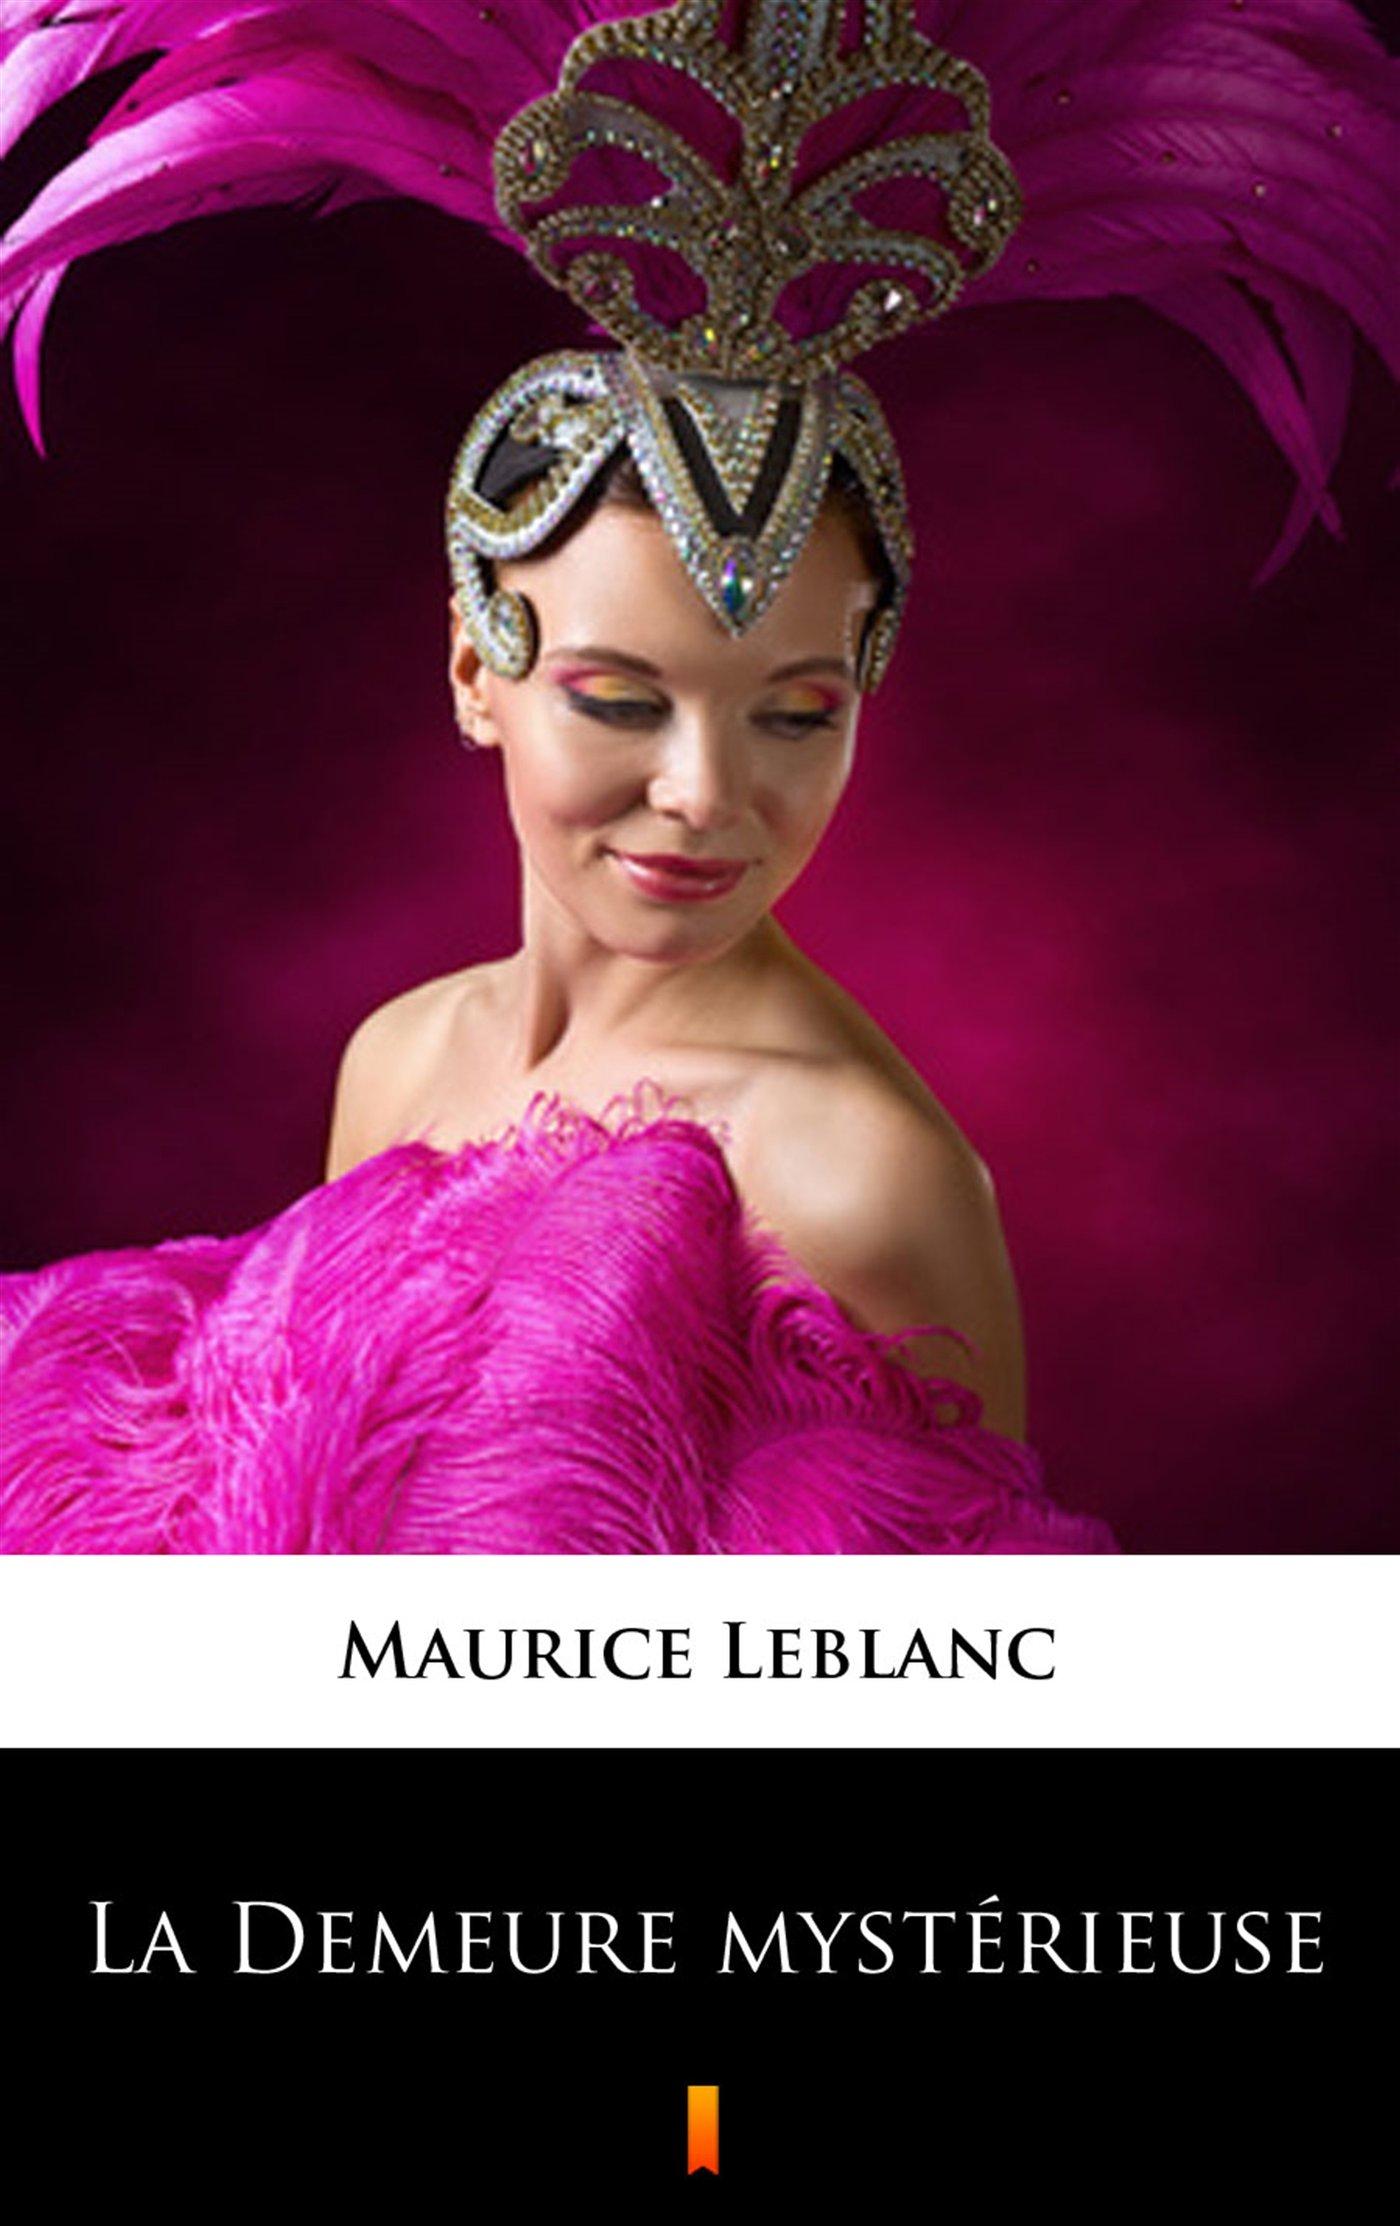 La Demeure mysterieuse - Ebook (Książka na Kindle) do pobrania w formacie MOBI